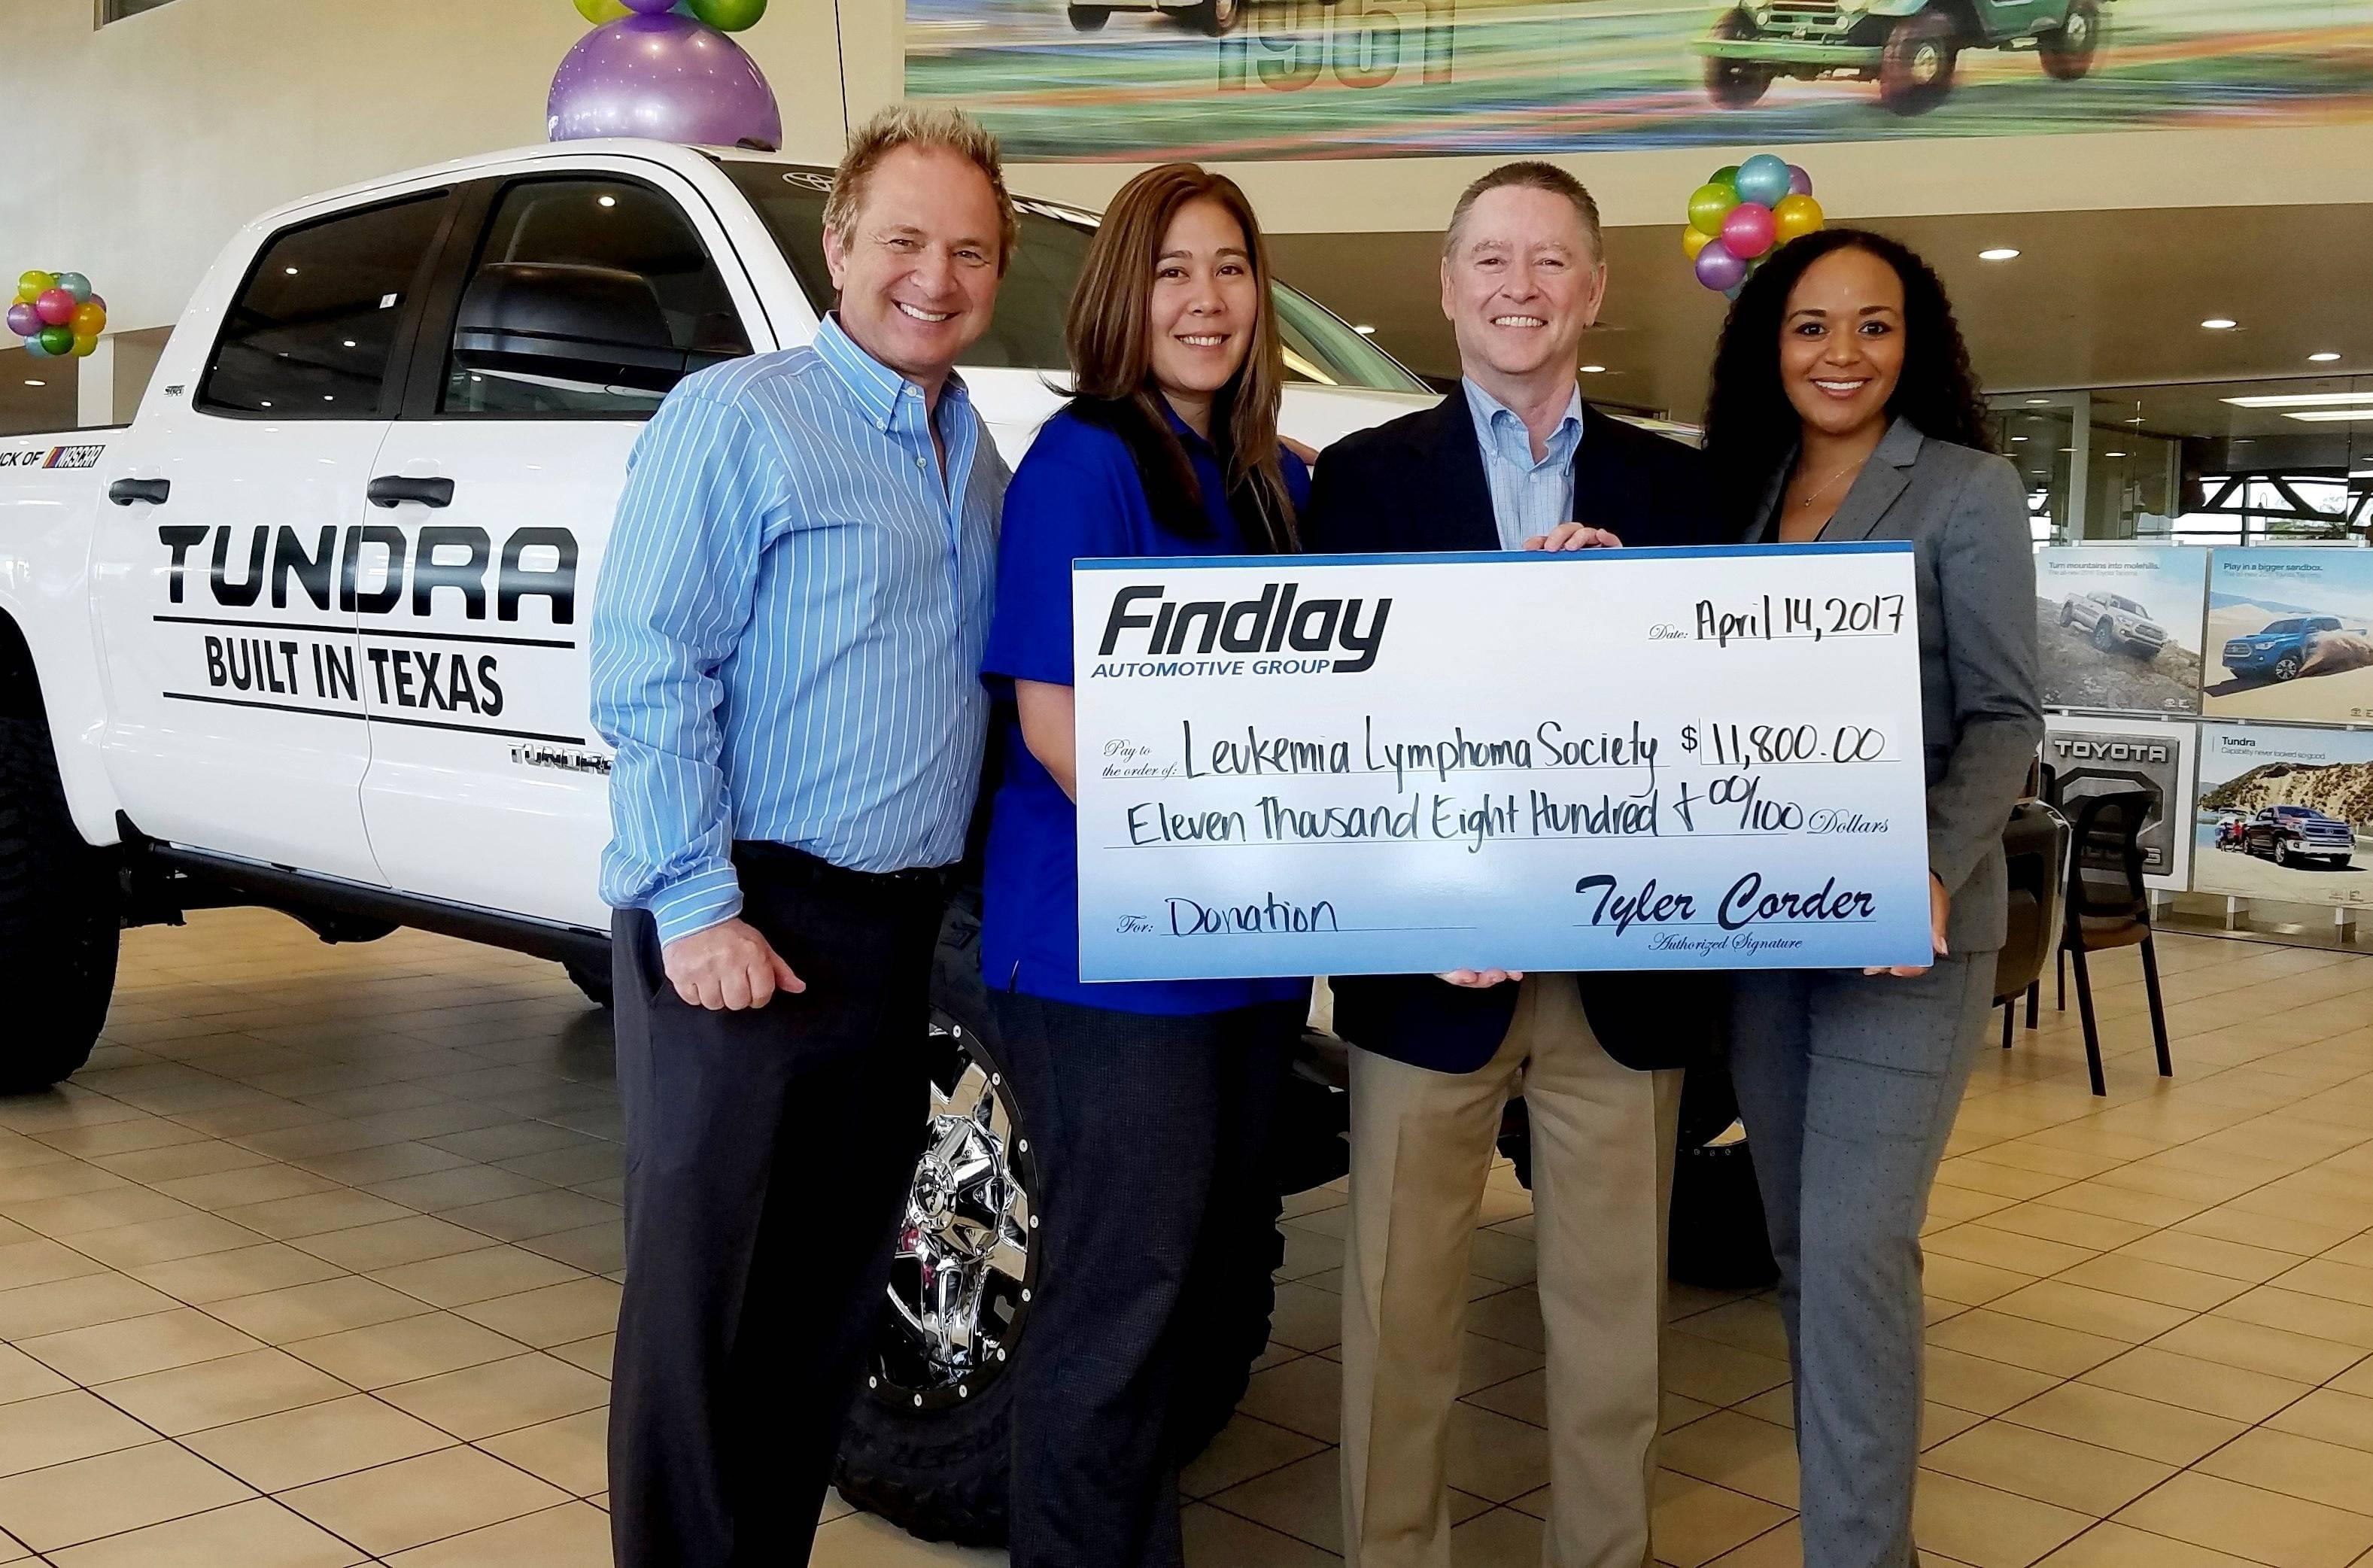 Awesome Findlay Toyotau0027s John Barr Will Do Anything To Raise Money For The Leukemia  U0026 Lymphoma Society | Findlay Auto Group